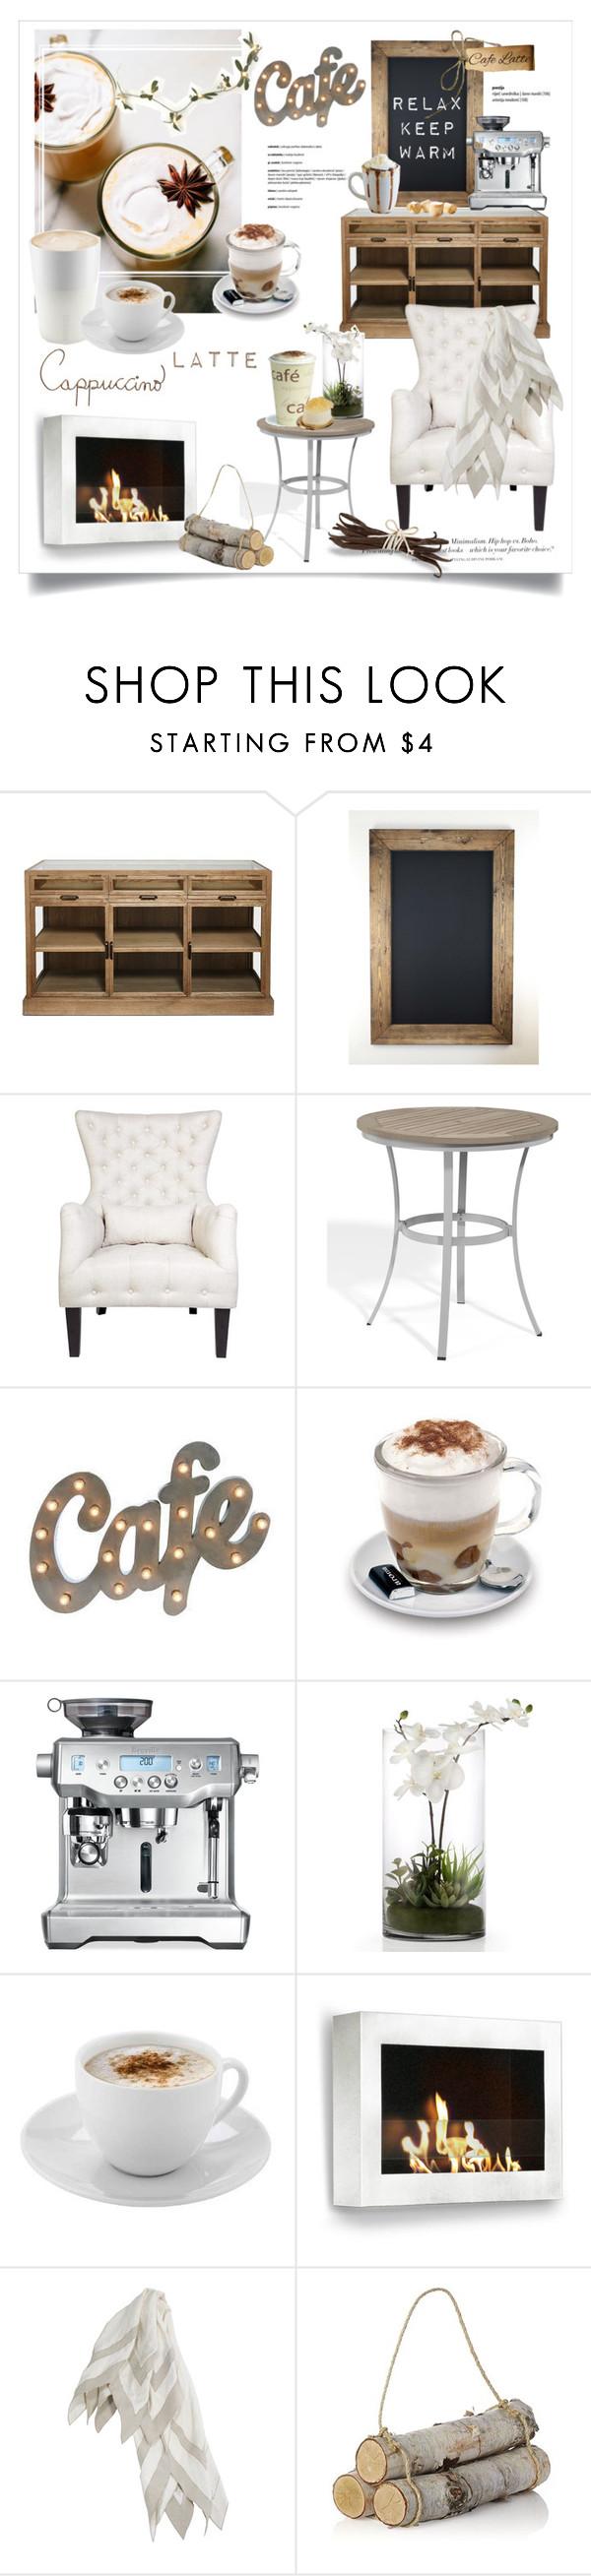 """Relaxed Cafe"" by rever-de-paris ❤ liked on Polyvore featuring interior, interiors, interior design, casa, home decor, interior decorating, Cafe Lighting, Oxford Garden, Eva Solo e Aroma"